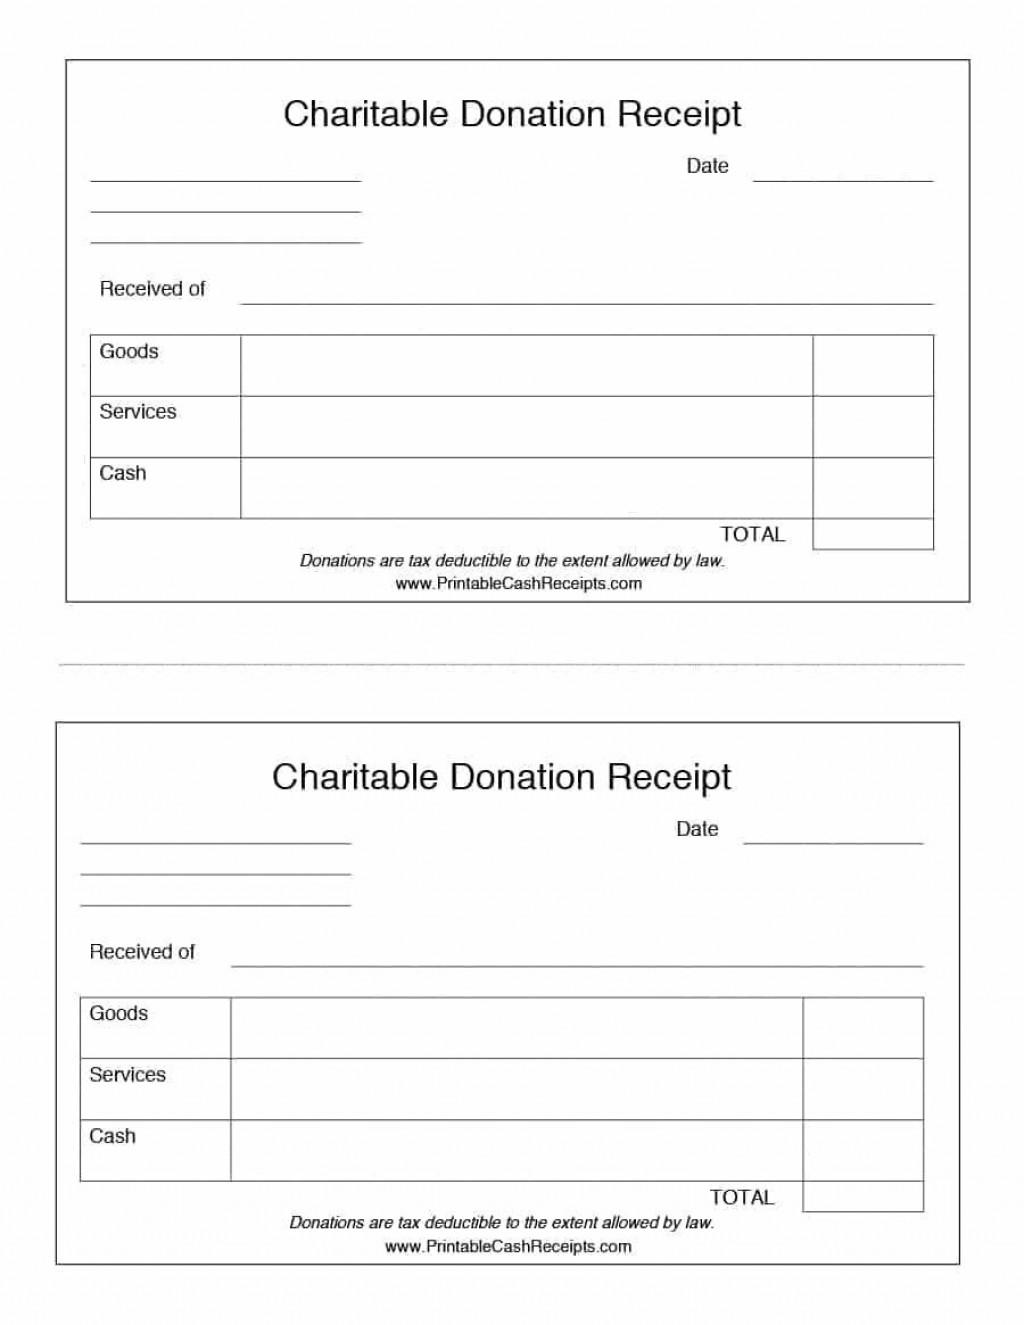 000 Shocking Charitable Tax Receipt Template Sample  DonationLarge